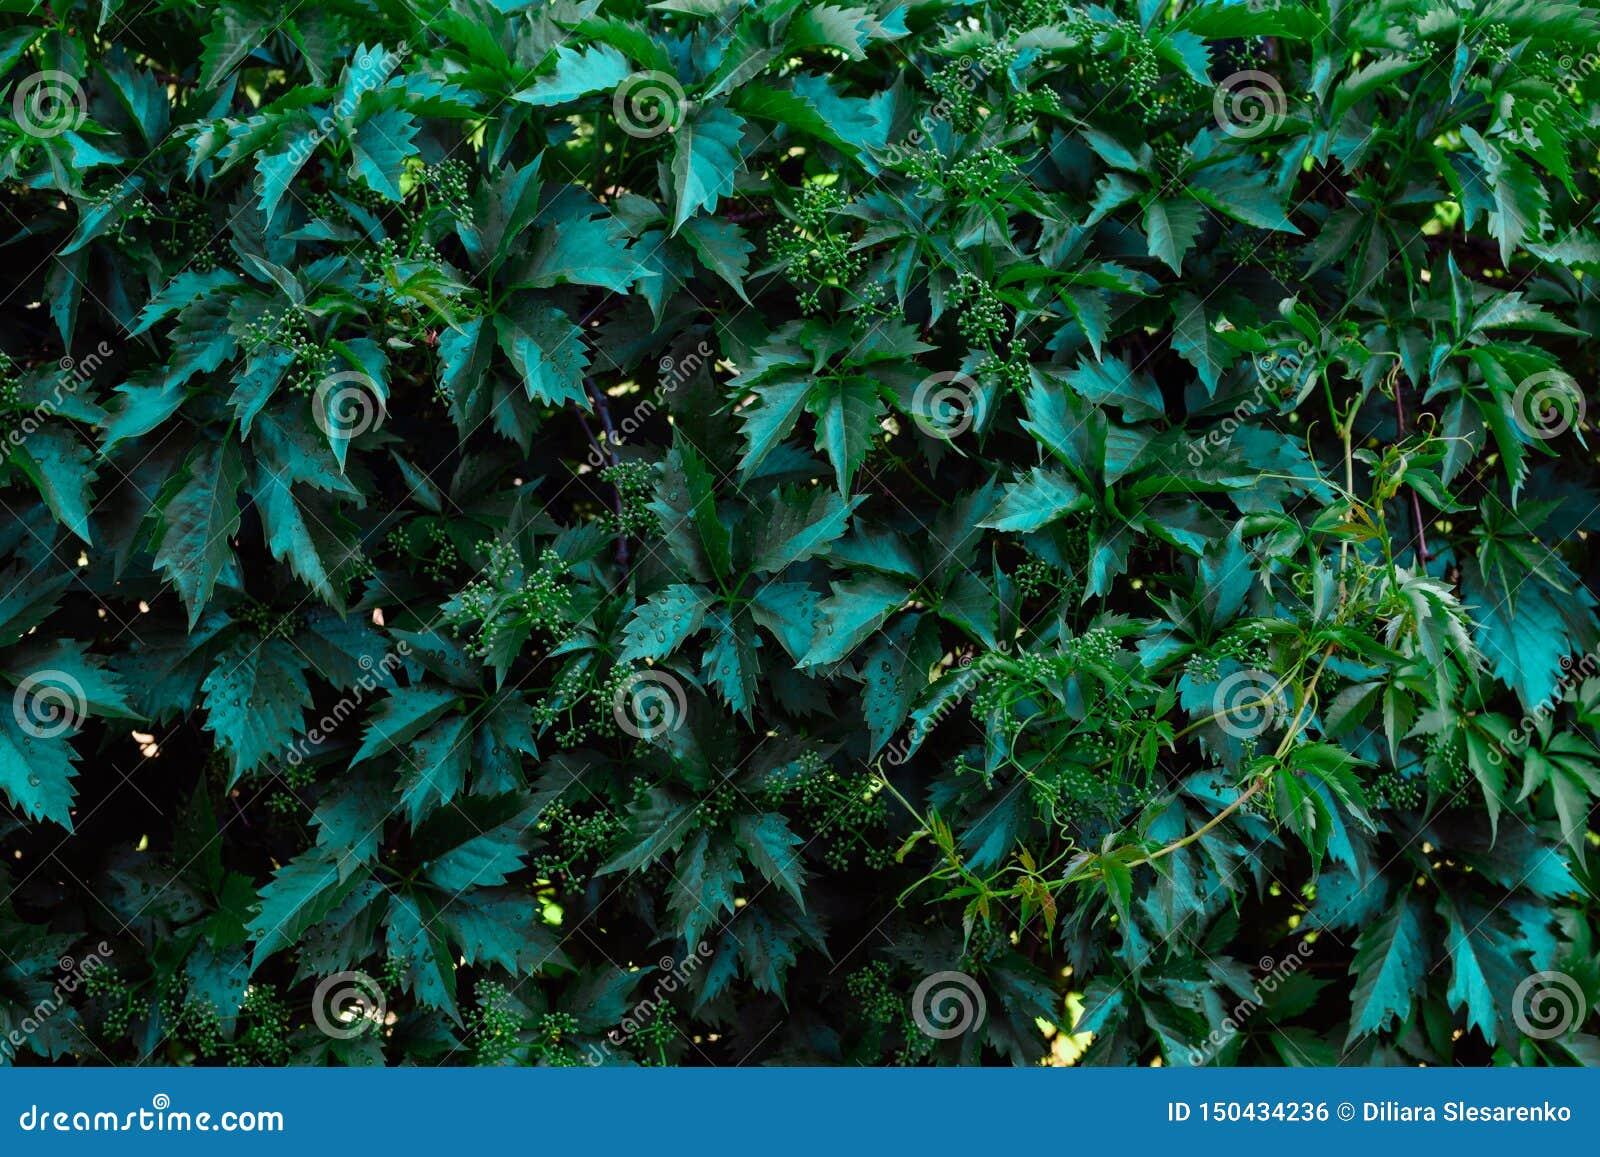 Natural dark greengrape leaves for background